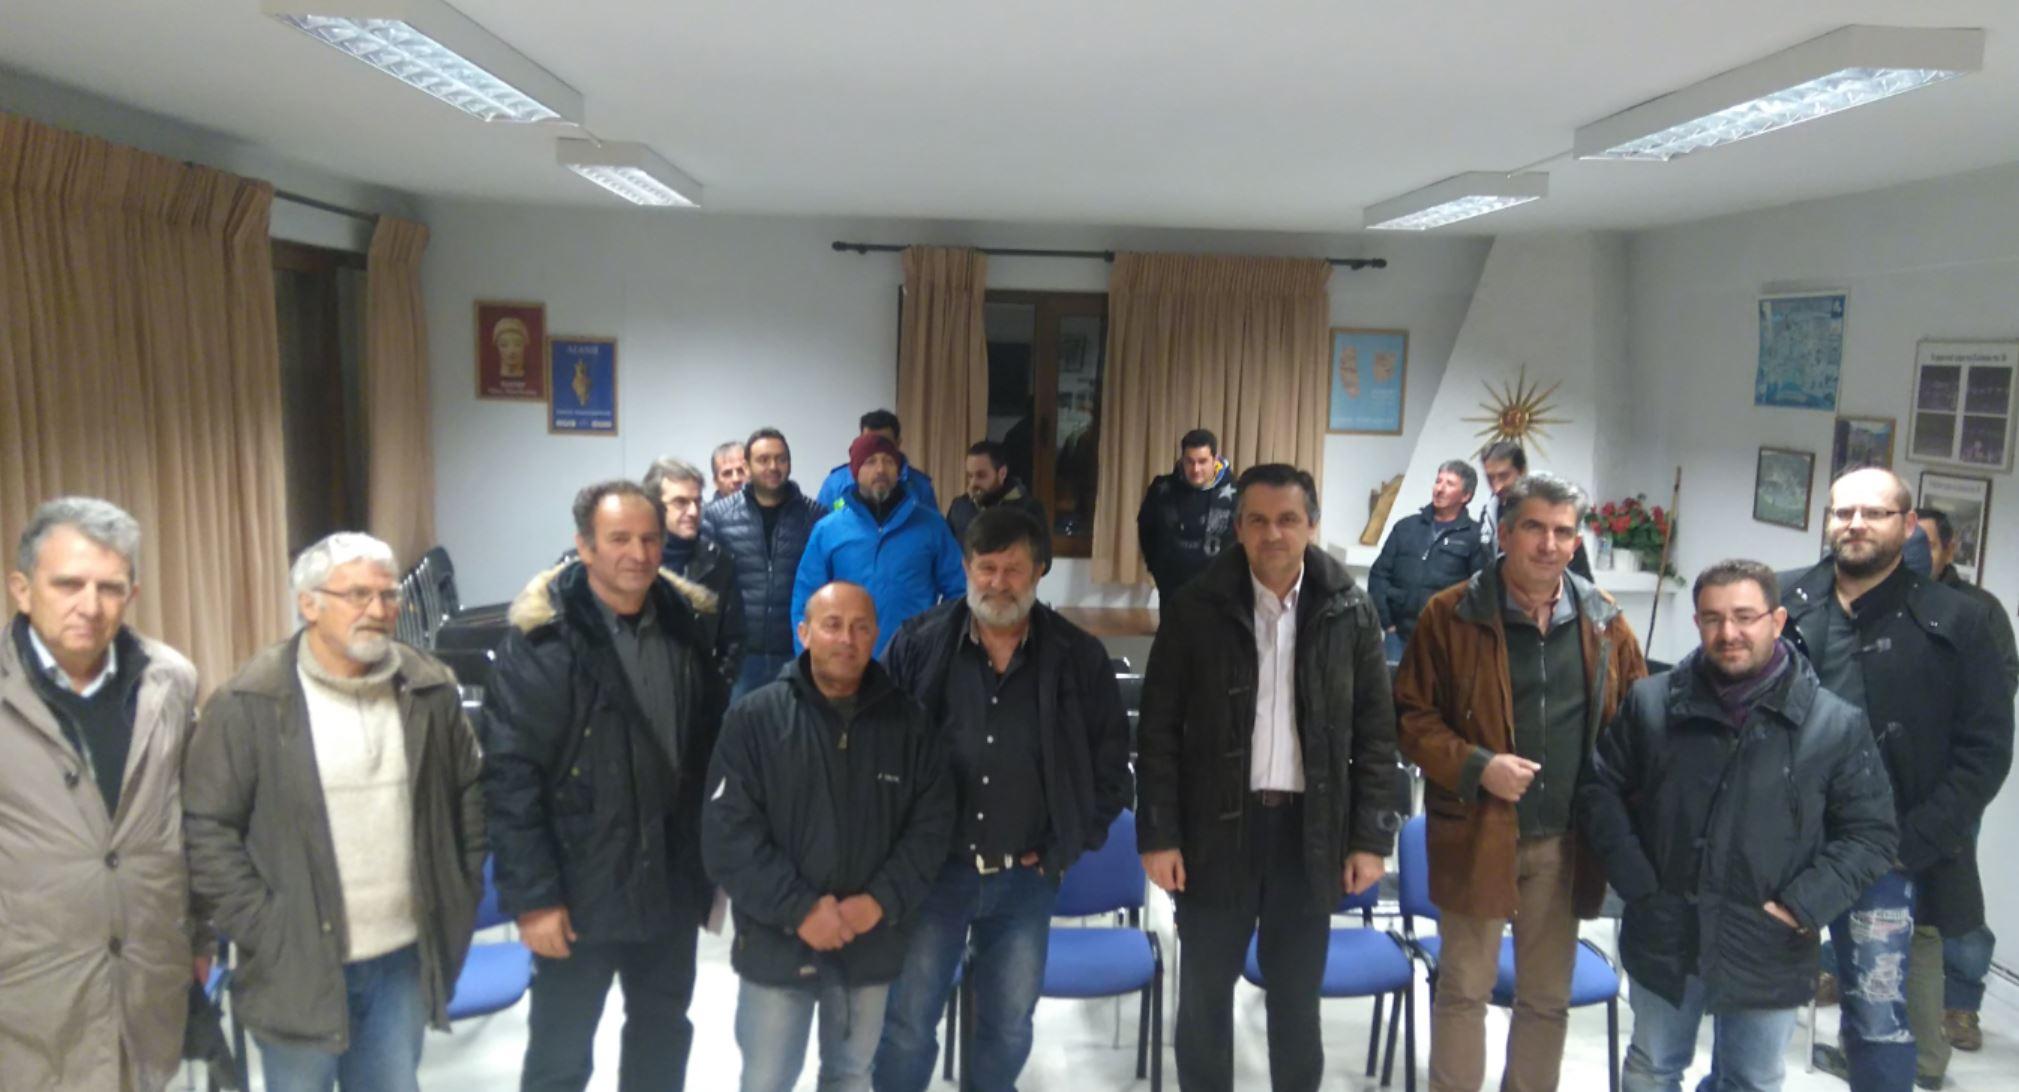 Mε παραγωγούς και πολίτες του Χρωμίου Kοζάνης συναντήθηκε ο Γ. Κασαπίδης